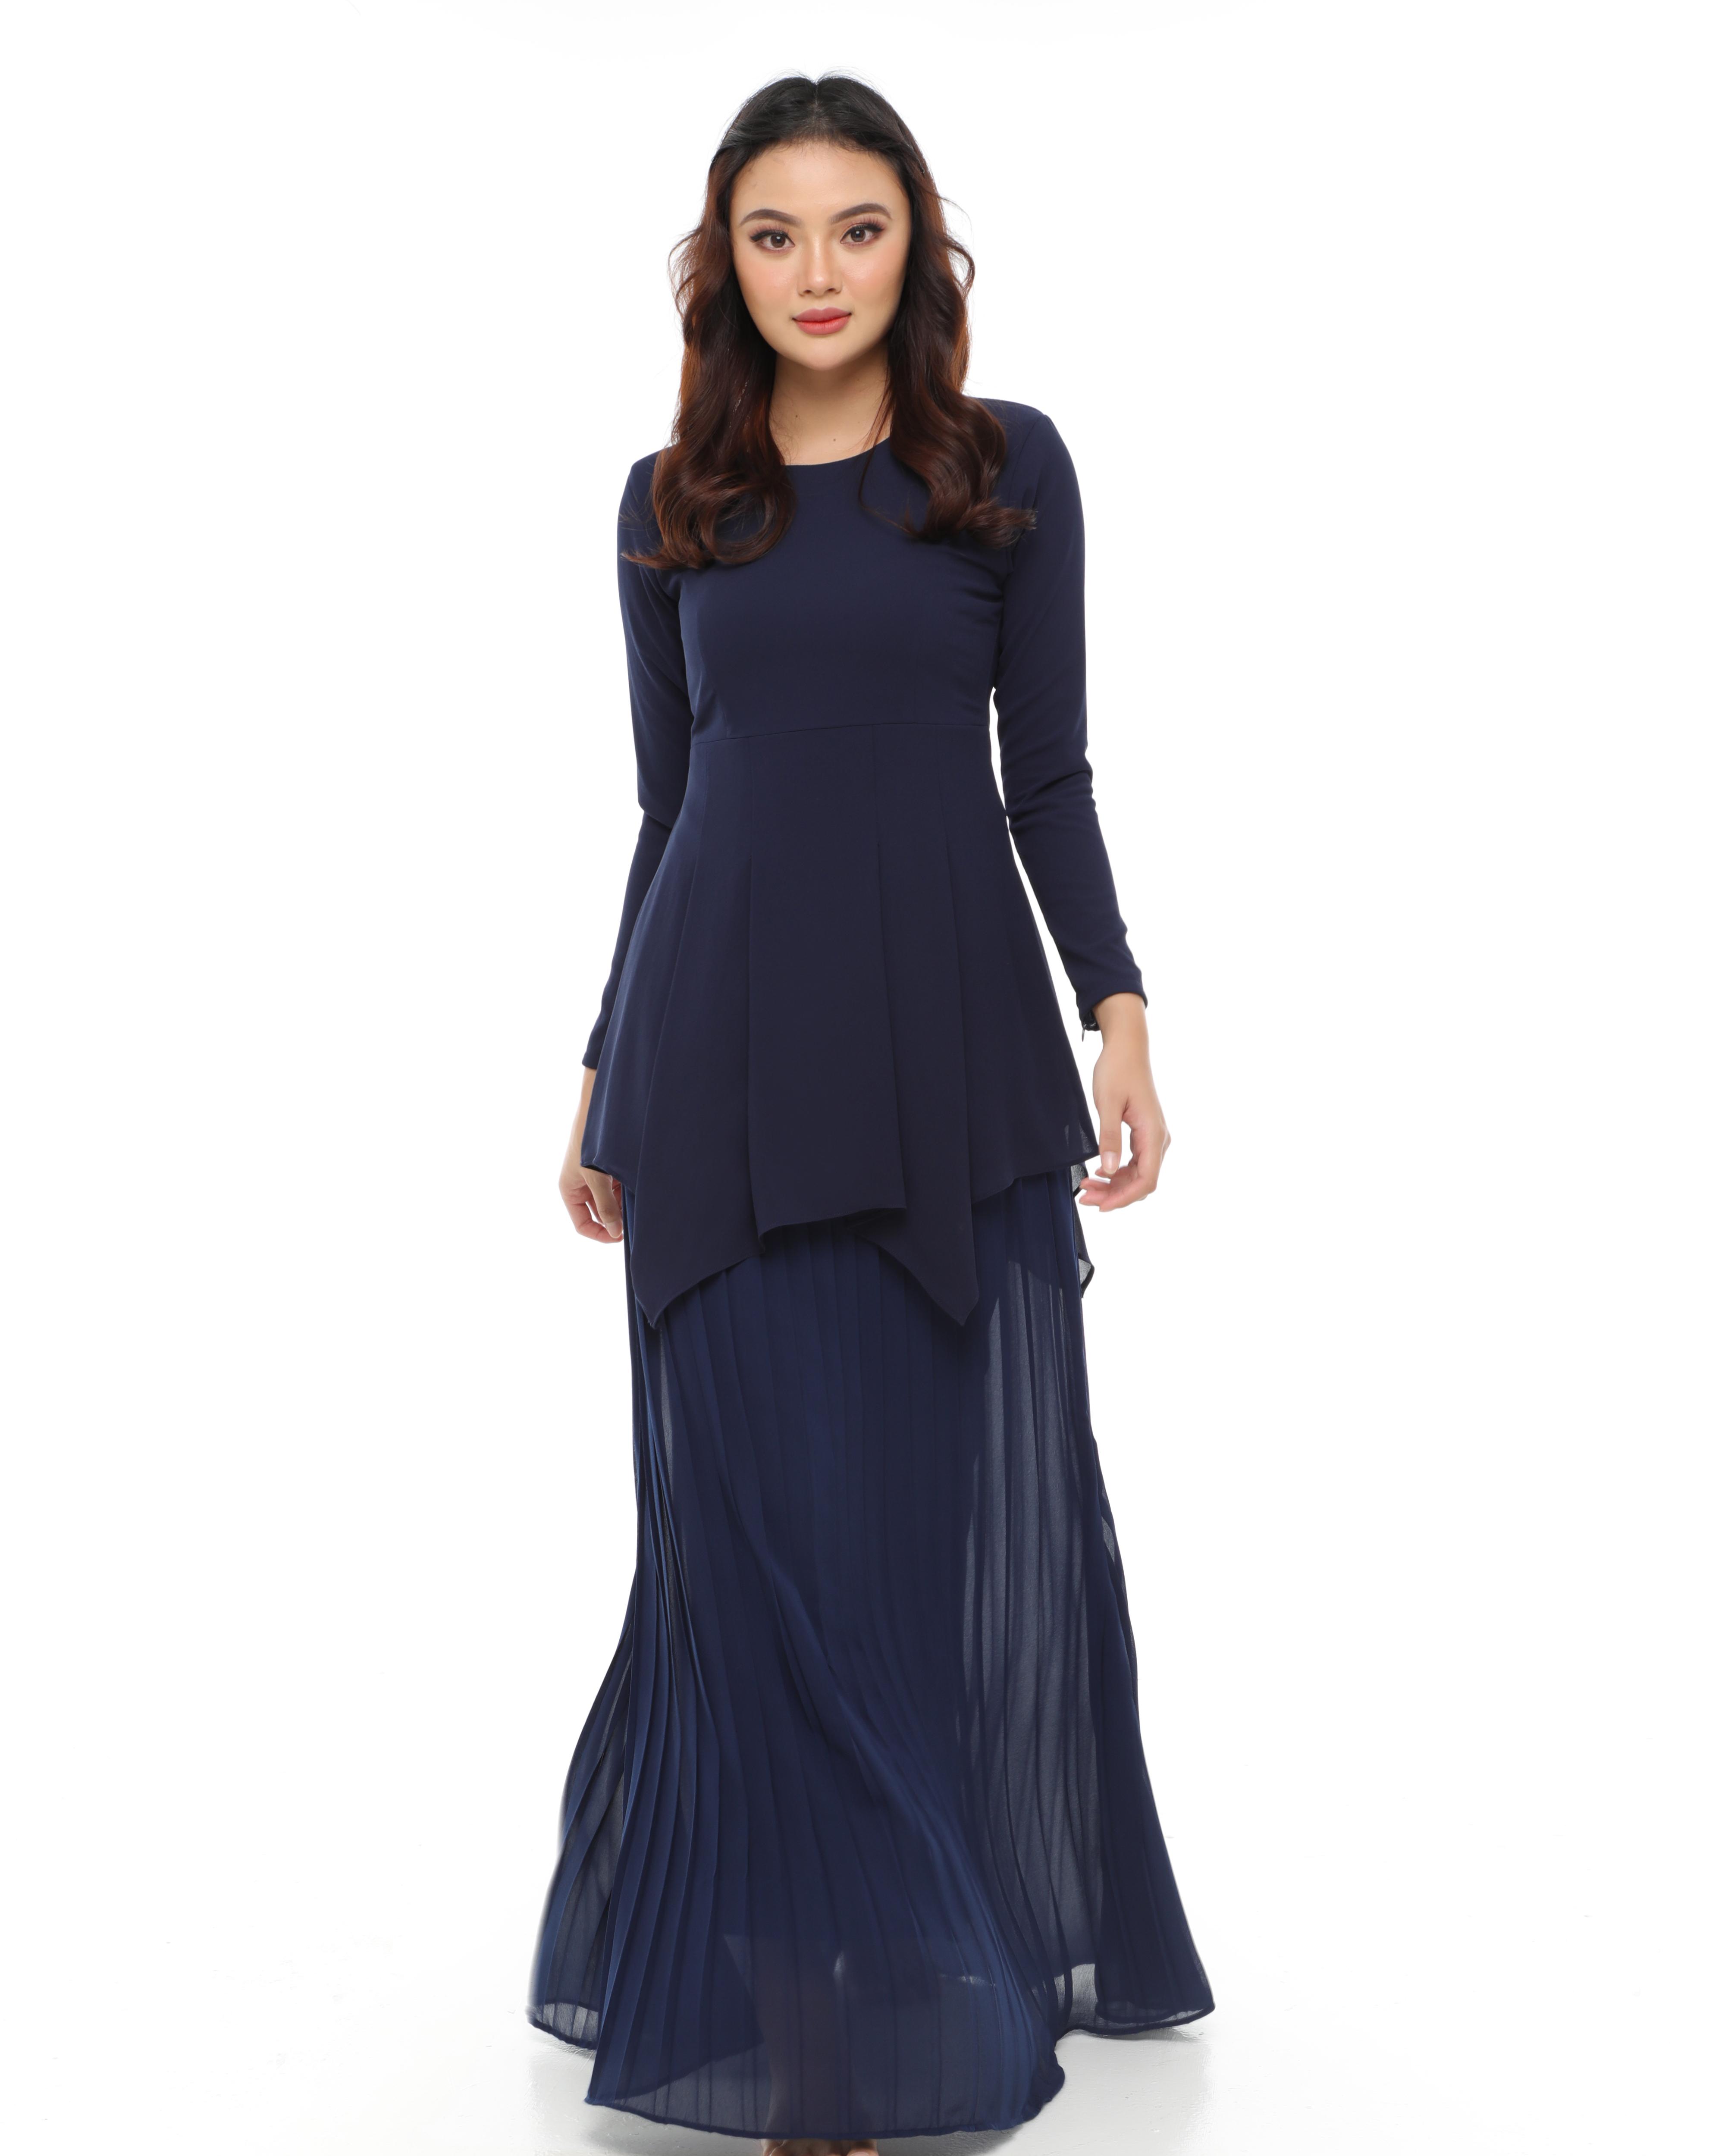 Kasandra - Navy Blue